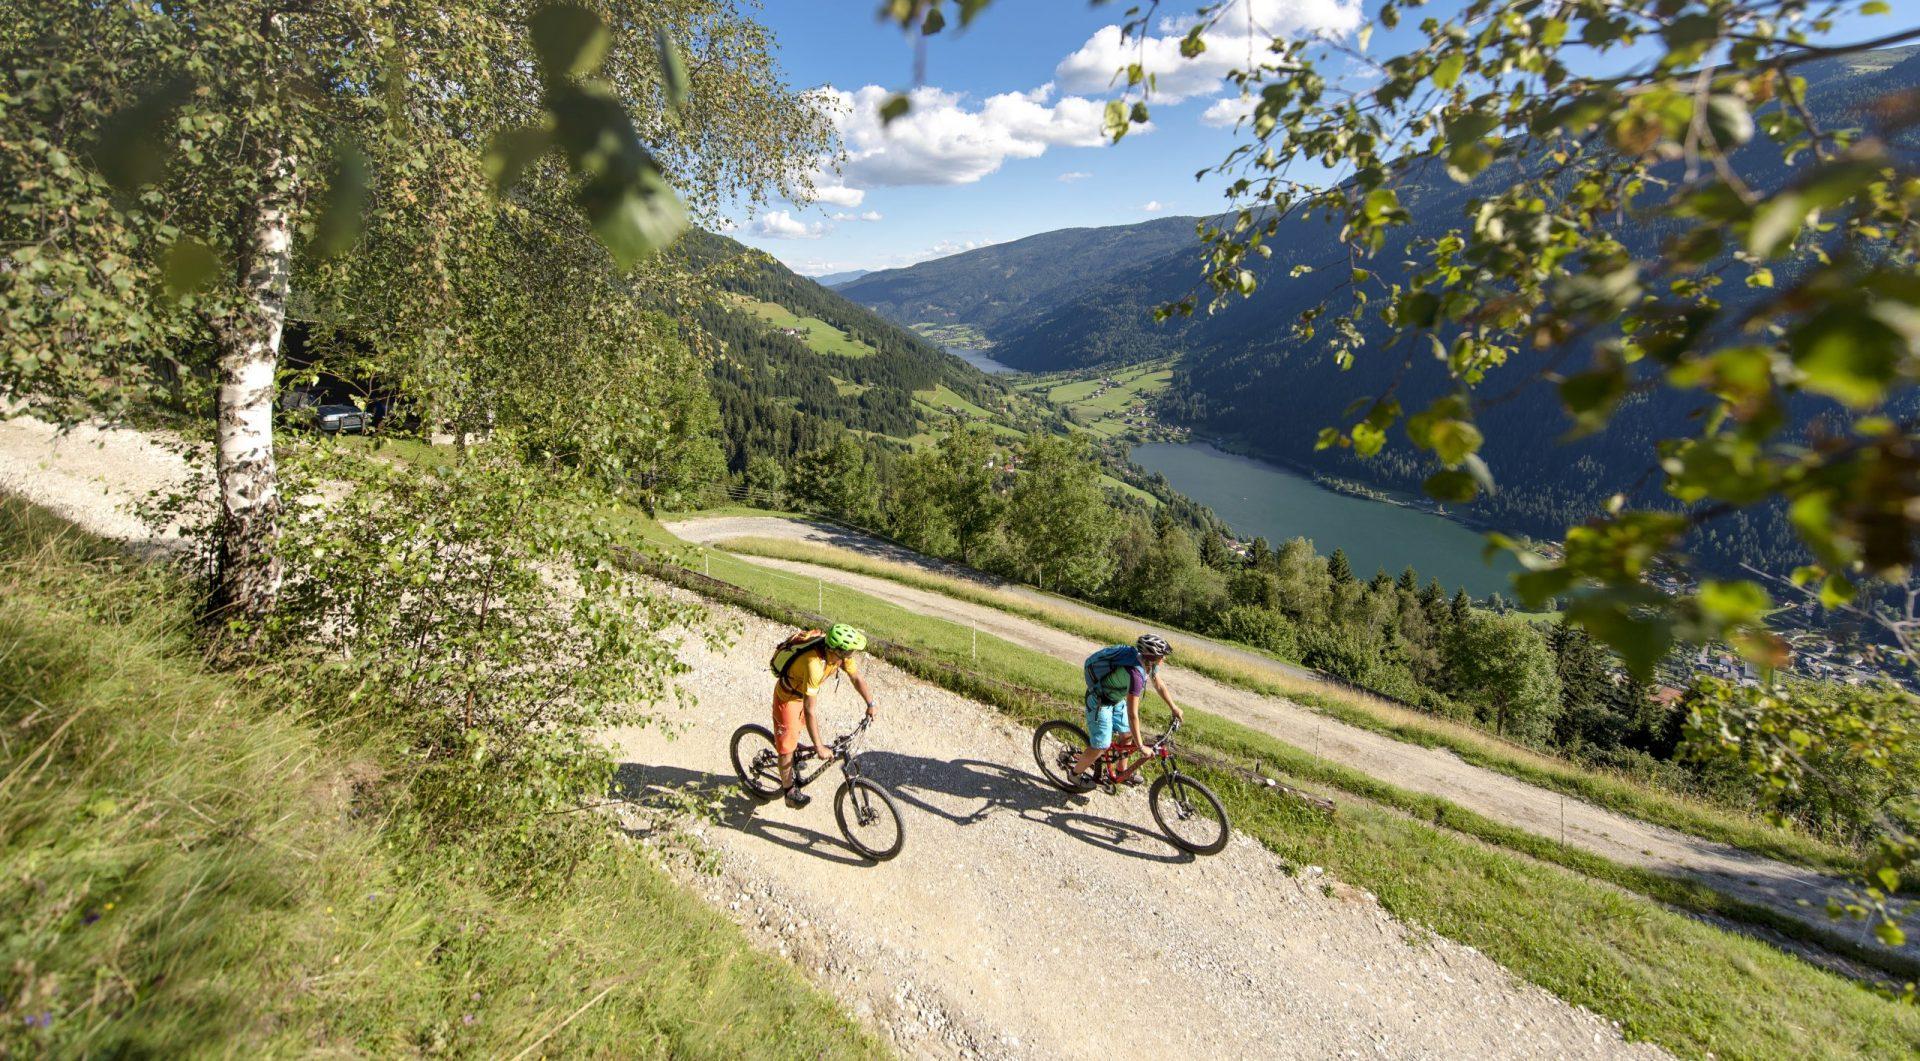 Trattlerhof Bike - Feld am See Region - Bad Kleinkirchheim ©FRANZGERDL2